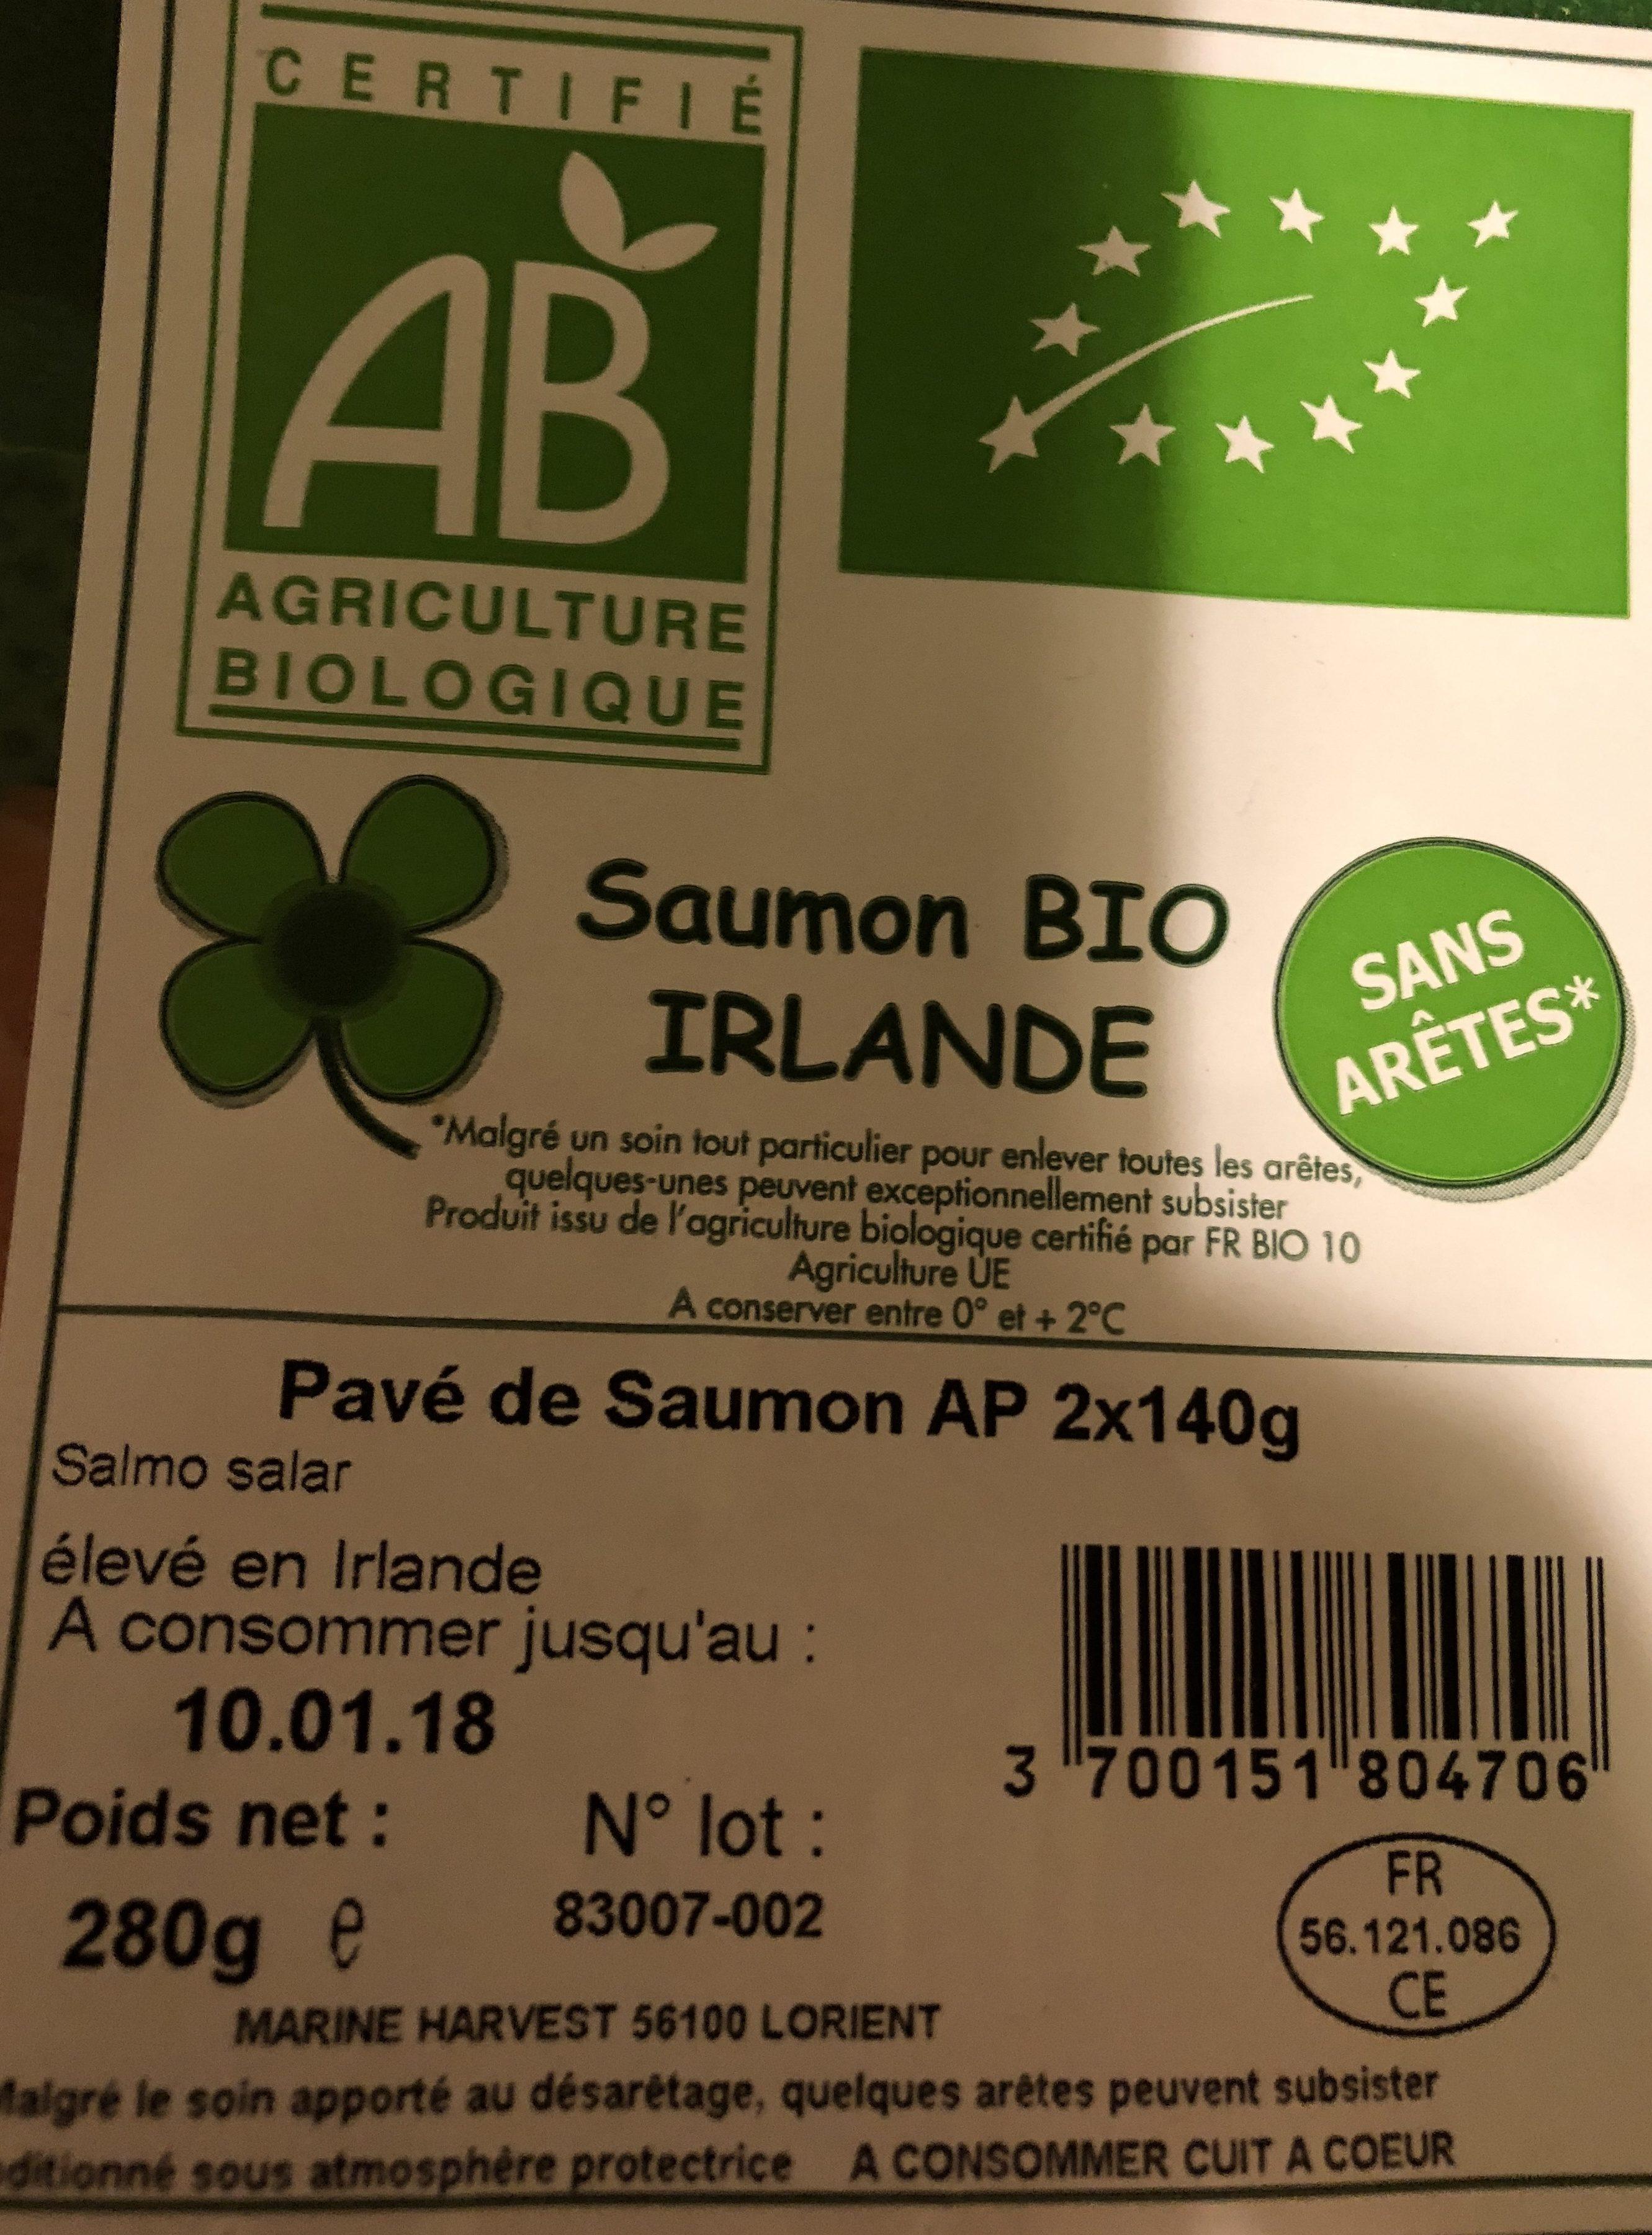 Saumon bio Irlande - Ingrediënten